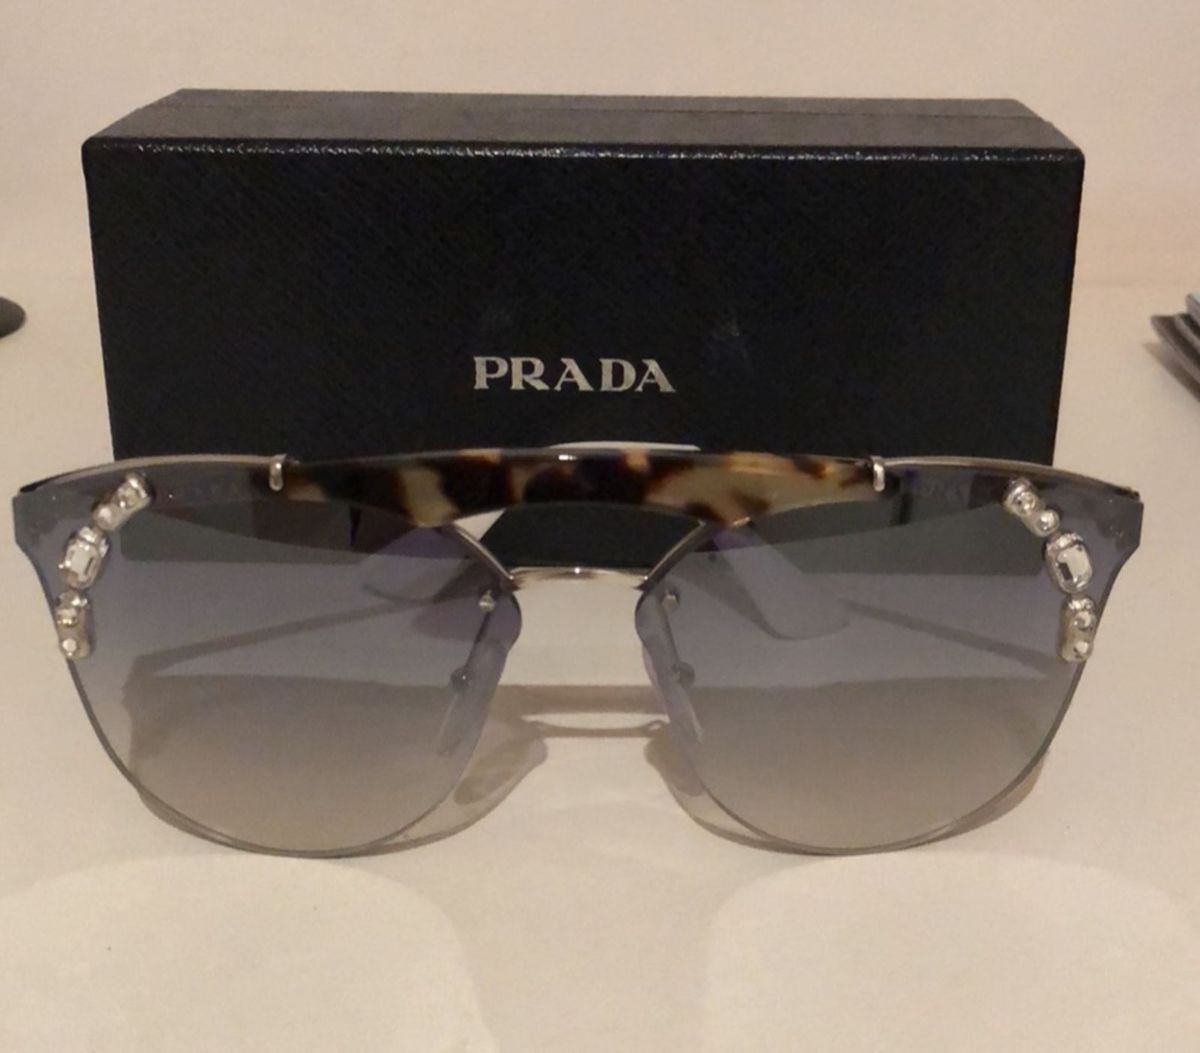 6df0797d00208 lançamento prada - óculos prada.  Czm6ly9wag90b3muzw5qb2vplmnvbs5ici9wcm9kdwn0cy84nty5nzu2lzljnzdmmtq4odrhndvjmme5zjk4m2ewm2finwuwmjgwlmpwzw  ...